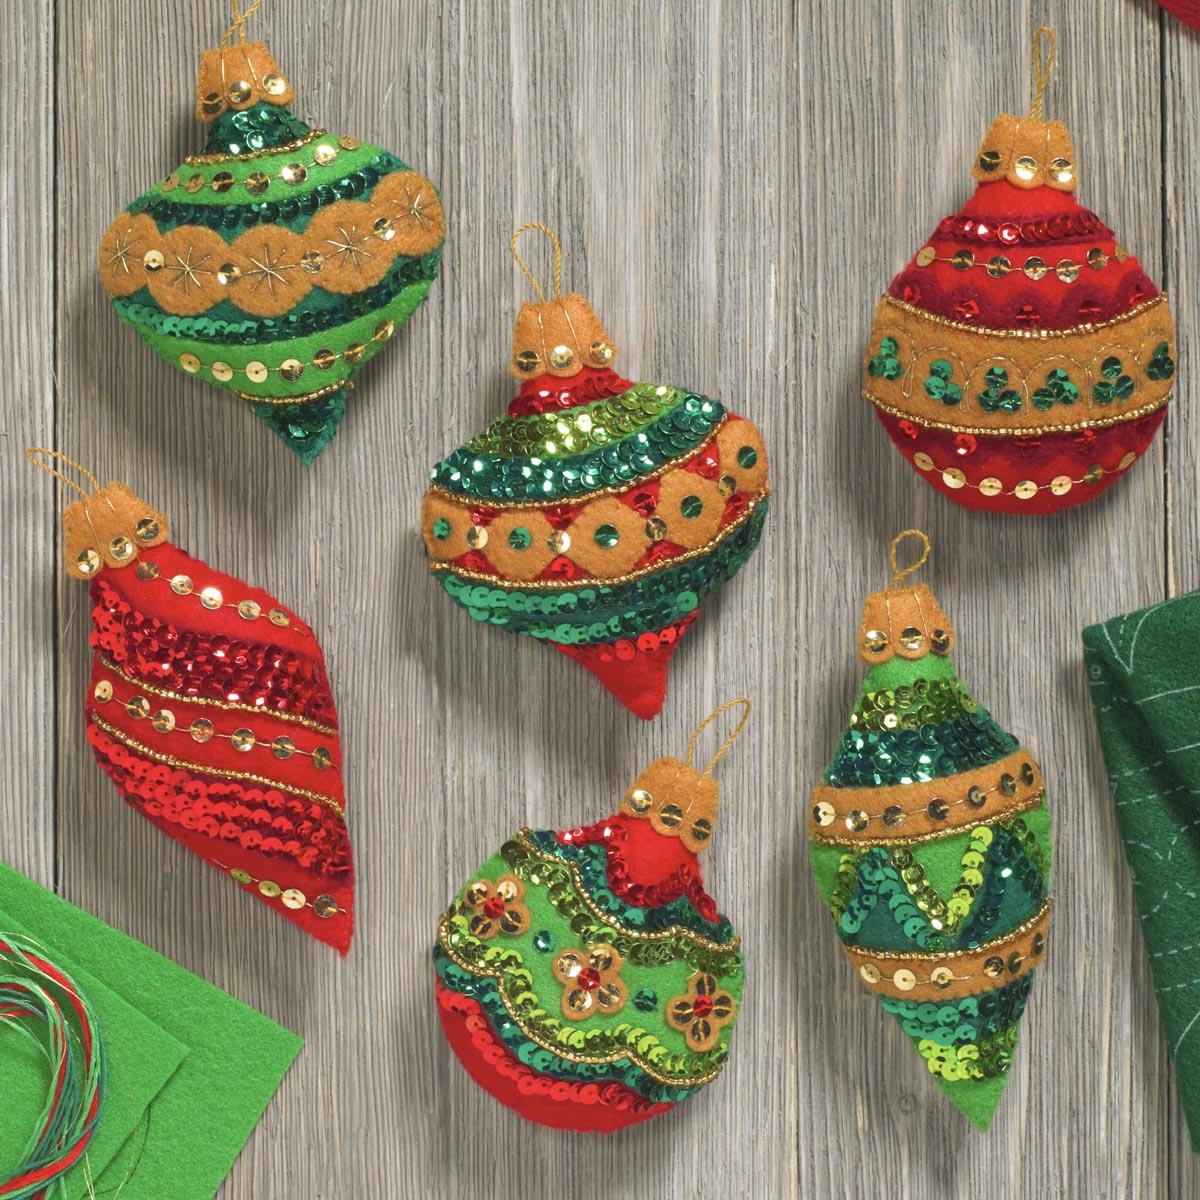 Bucilla ® Seasonal - Felt - Ornament Kits - Glitzy